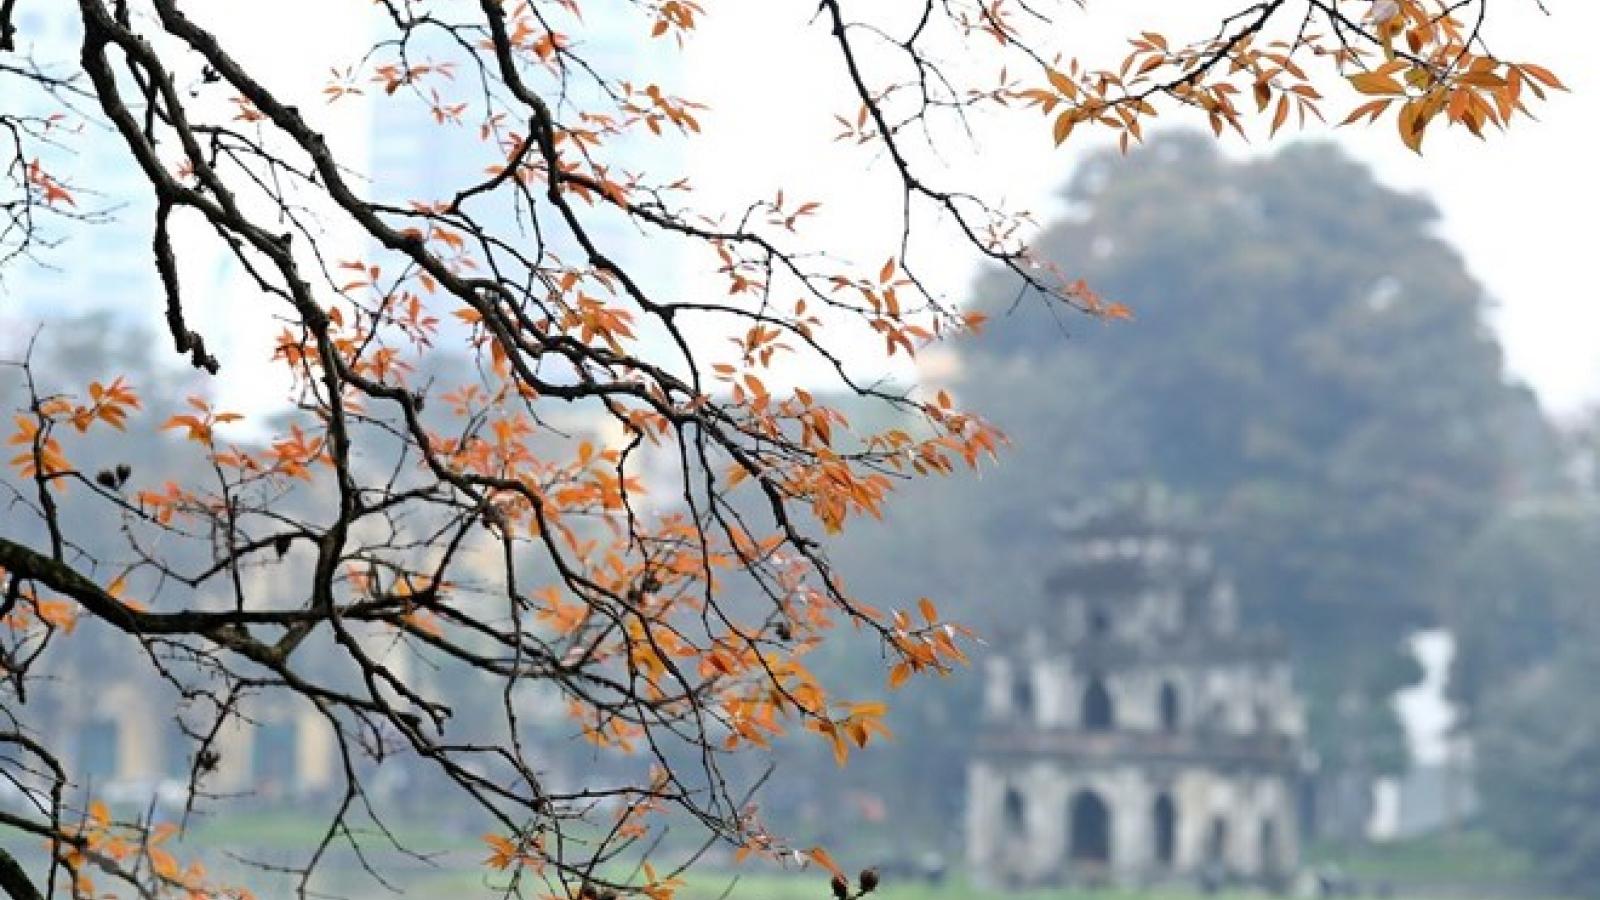 Hanoi listed in Top 25 global destinations by TripAdvisor